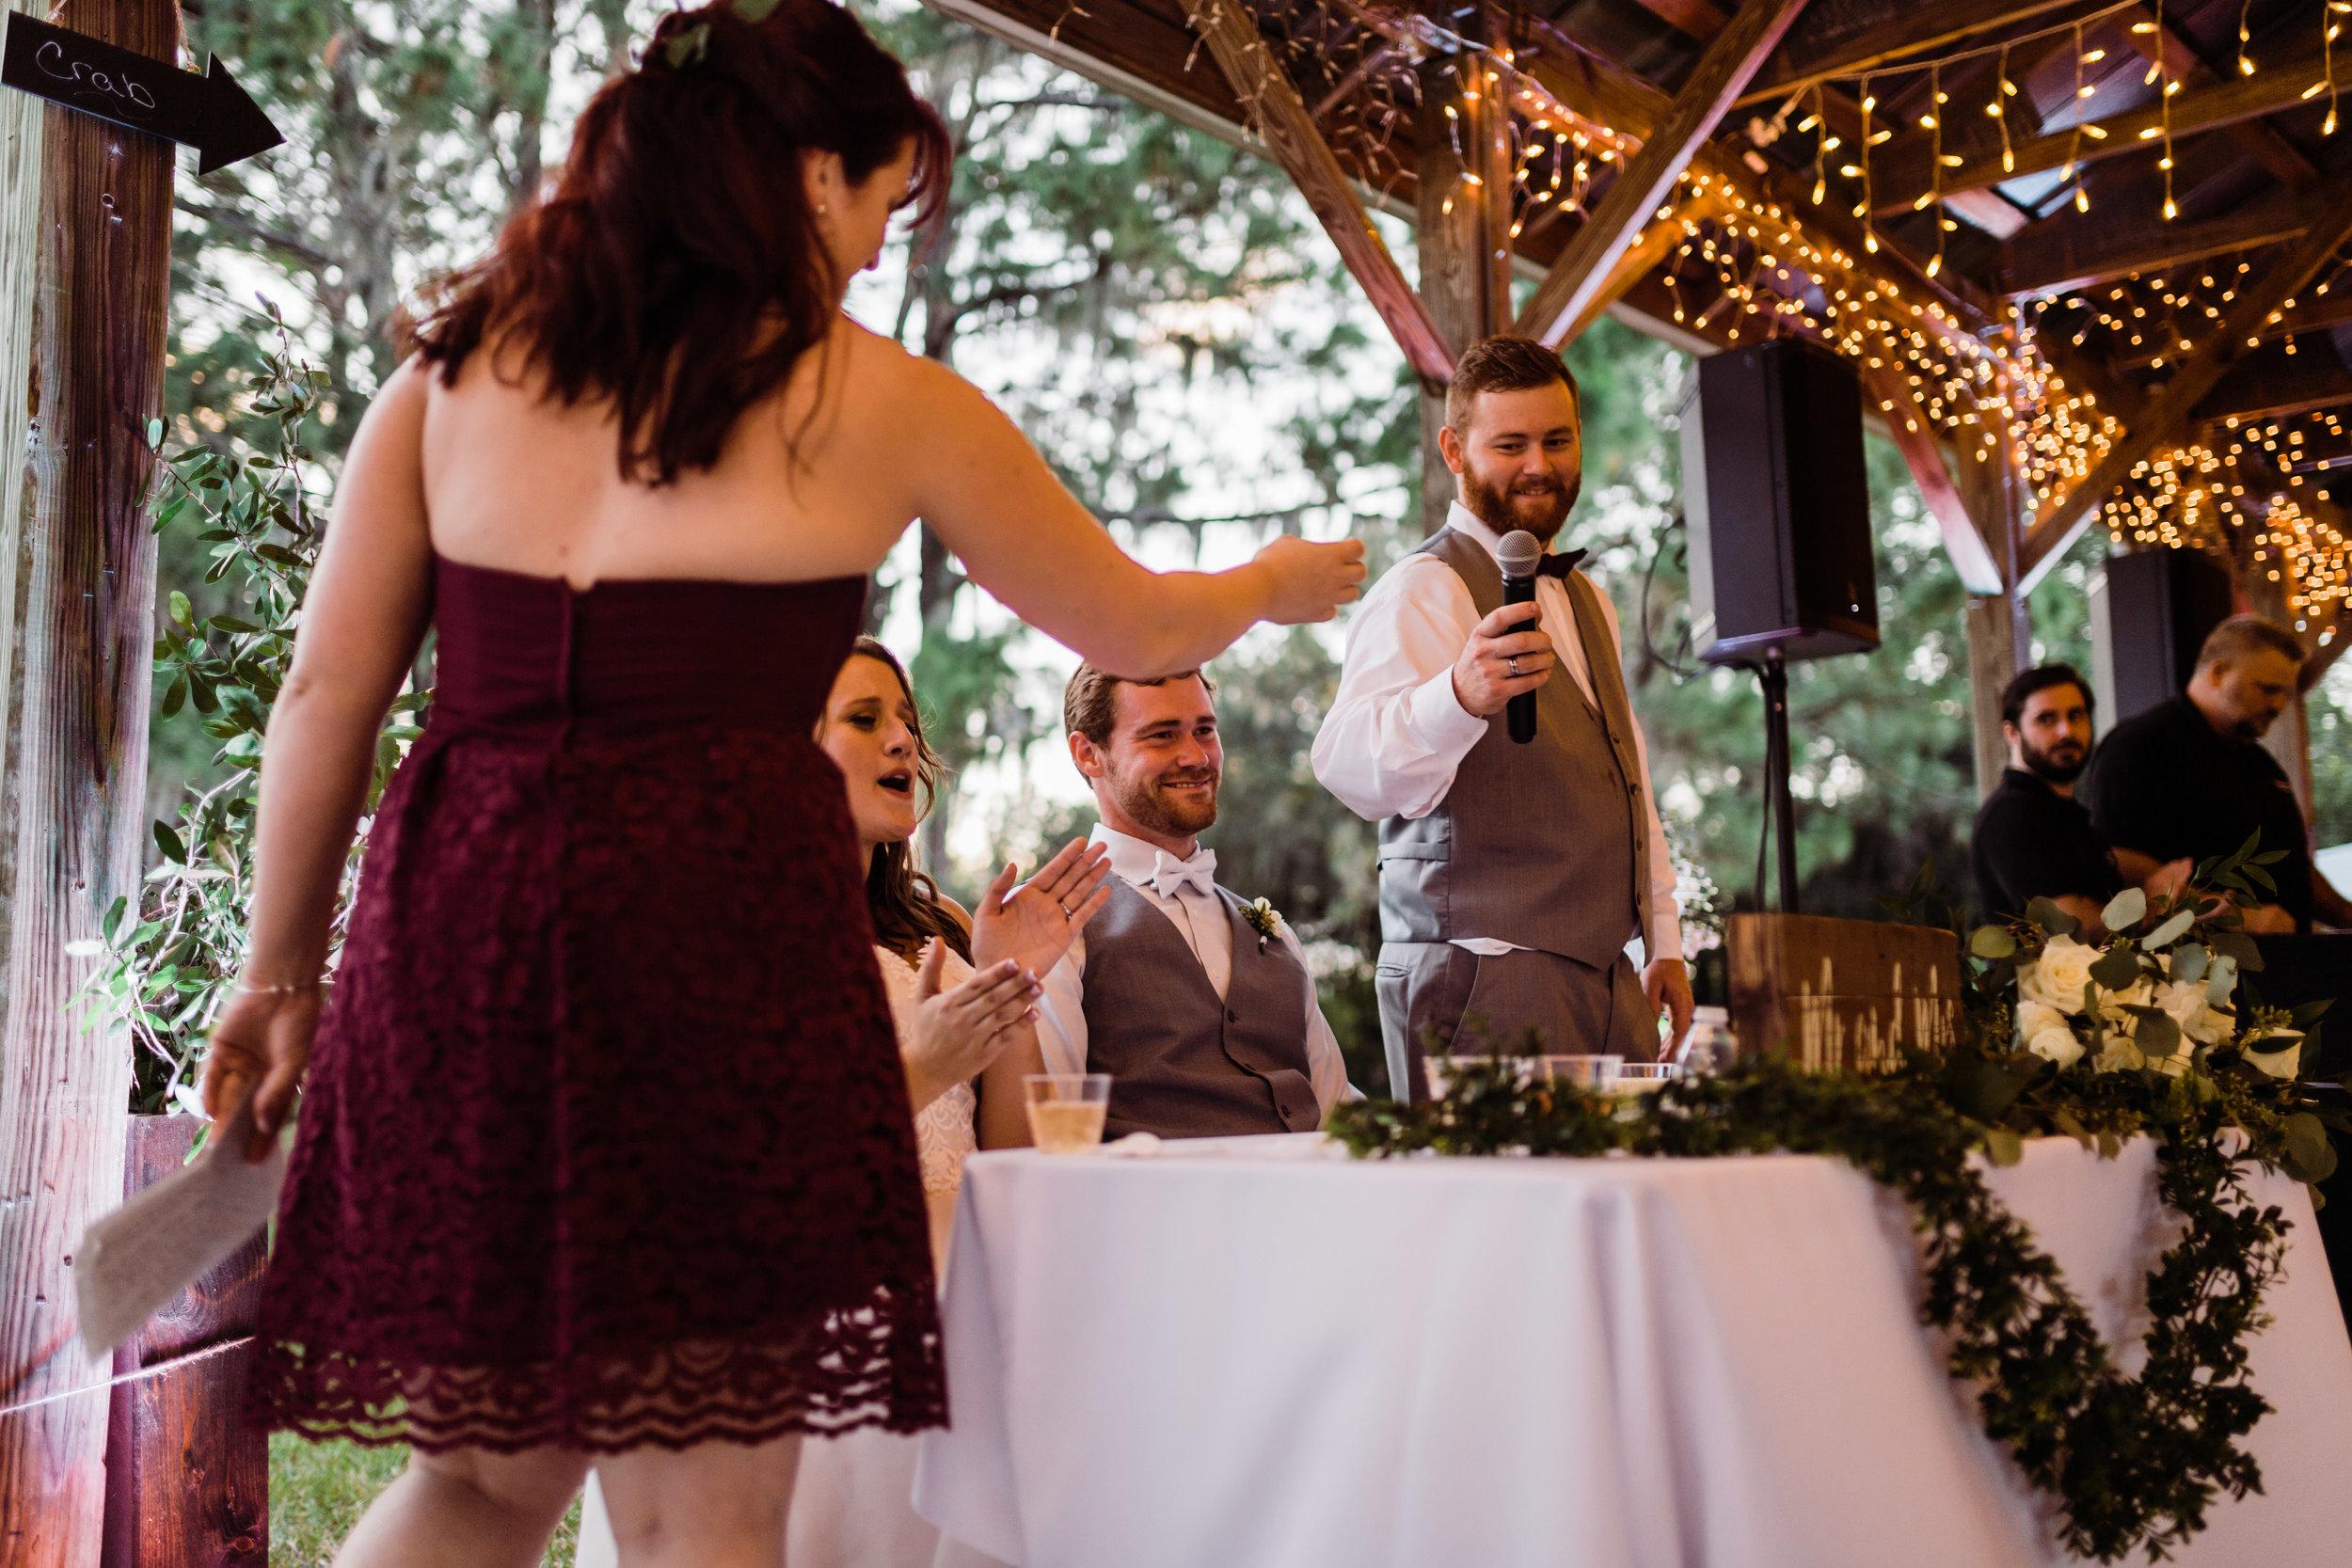 2017.10.14 Samantha and Matthew Crabtree Sarasota Wedding (535 of 708).jpg